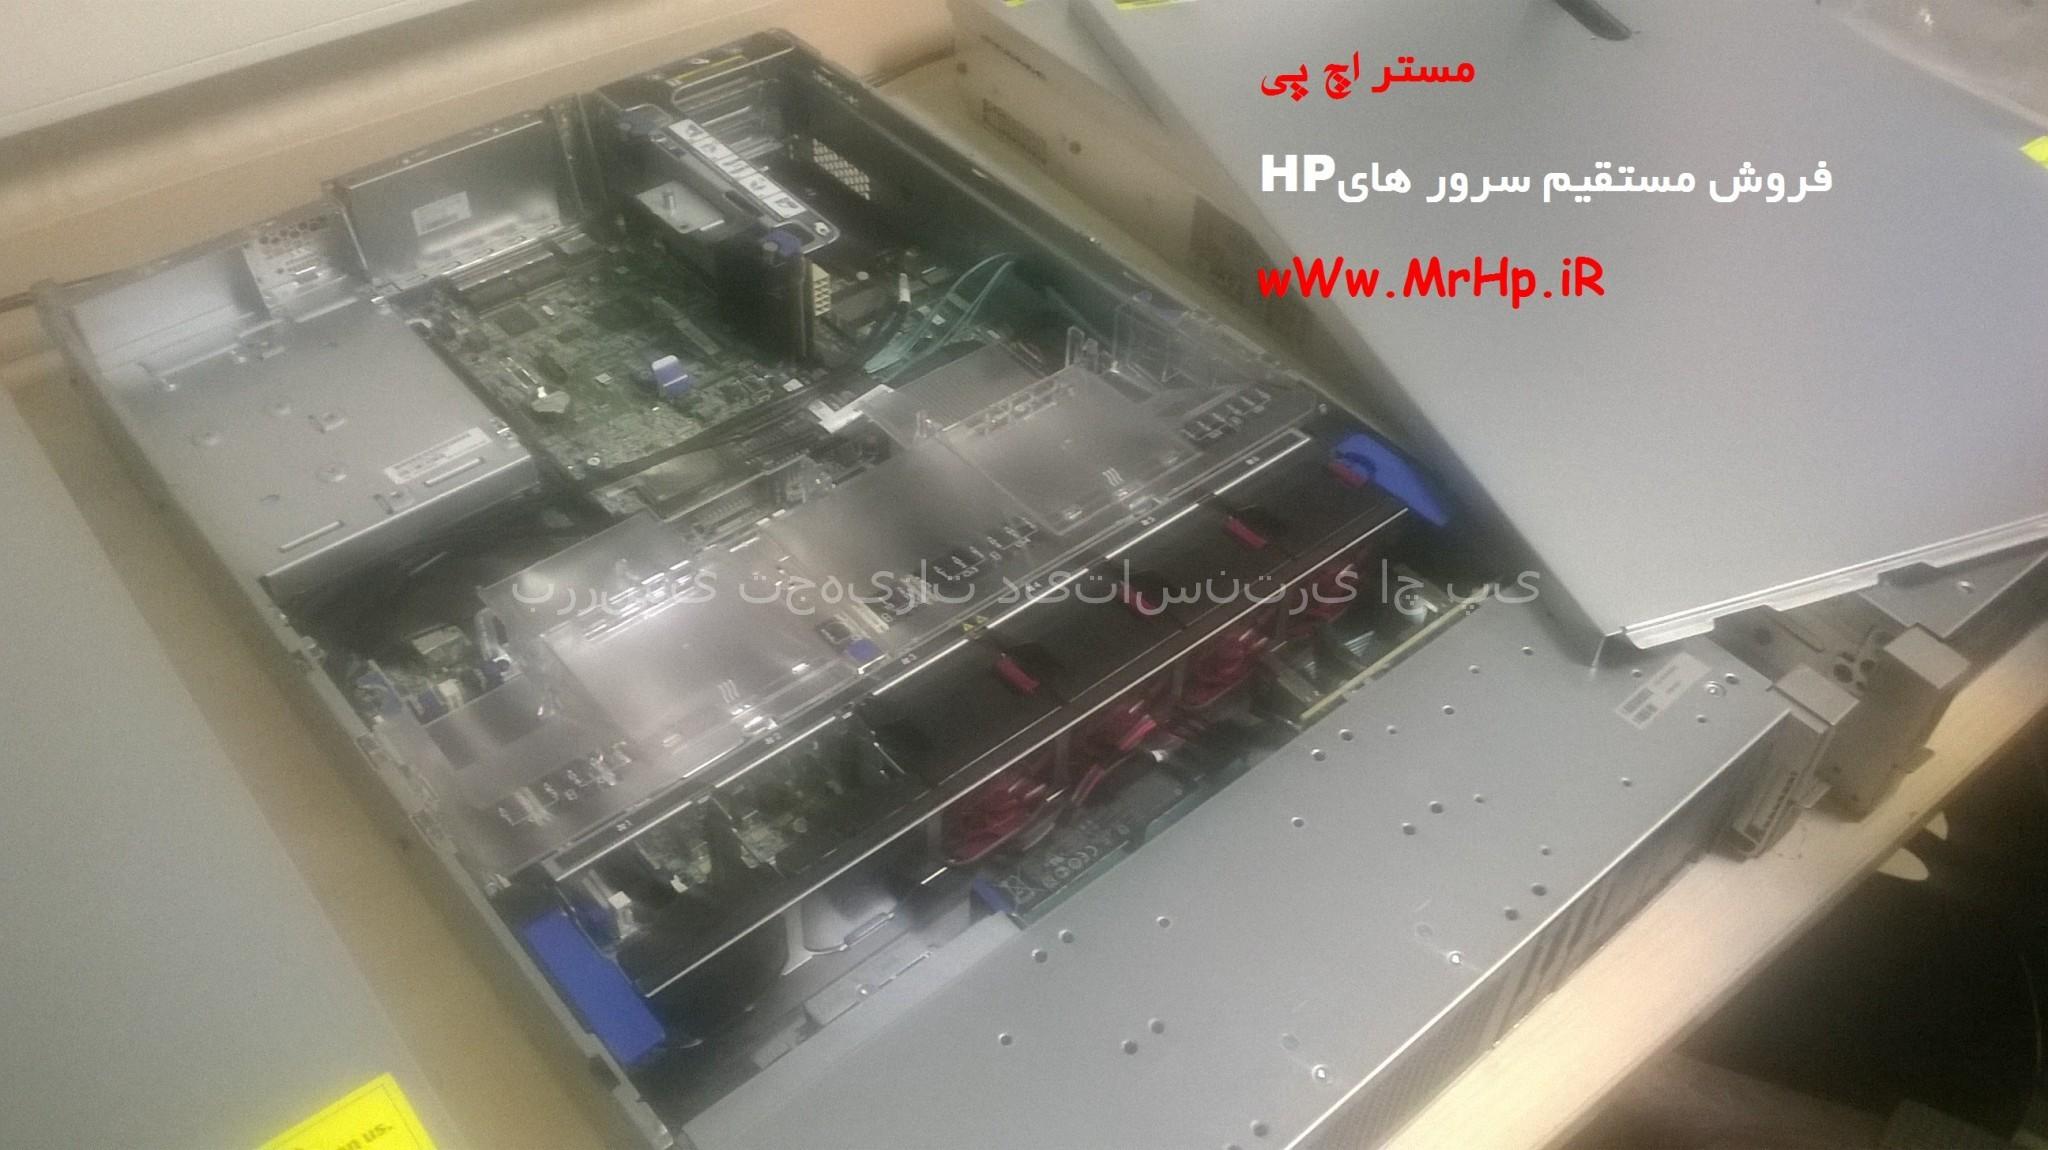 فروش سرور hp اچ پي,سرور DL380 G8 G9 Server HP